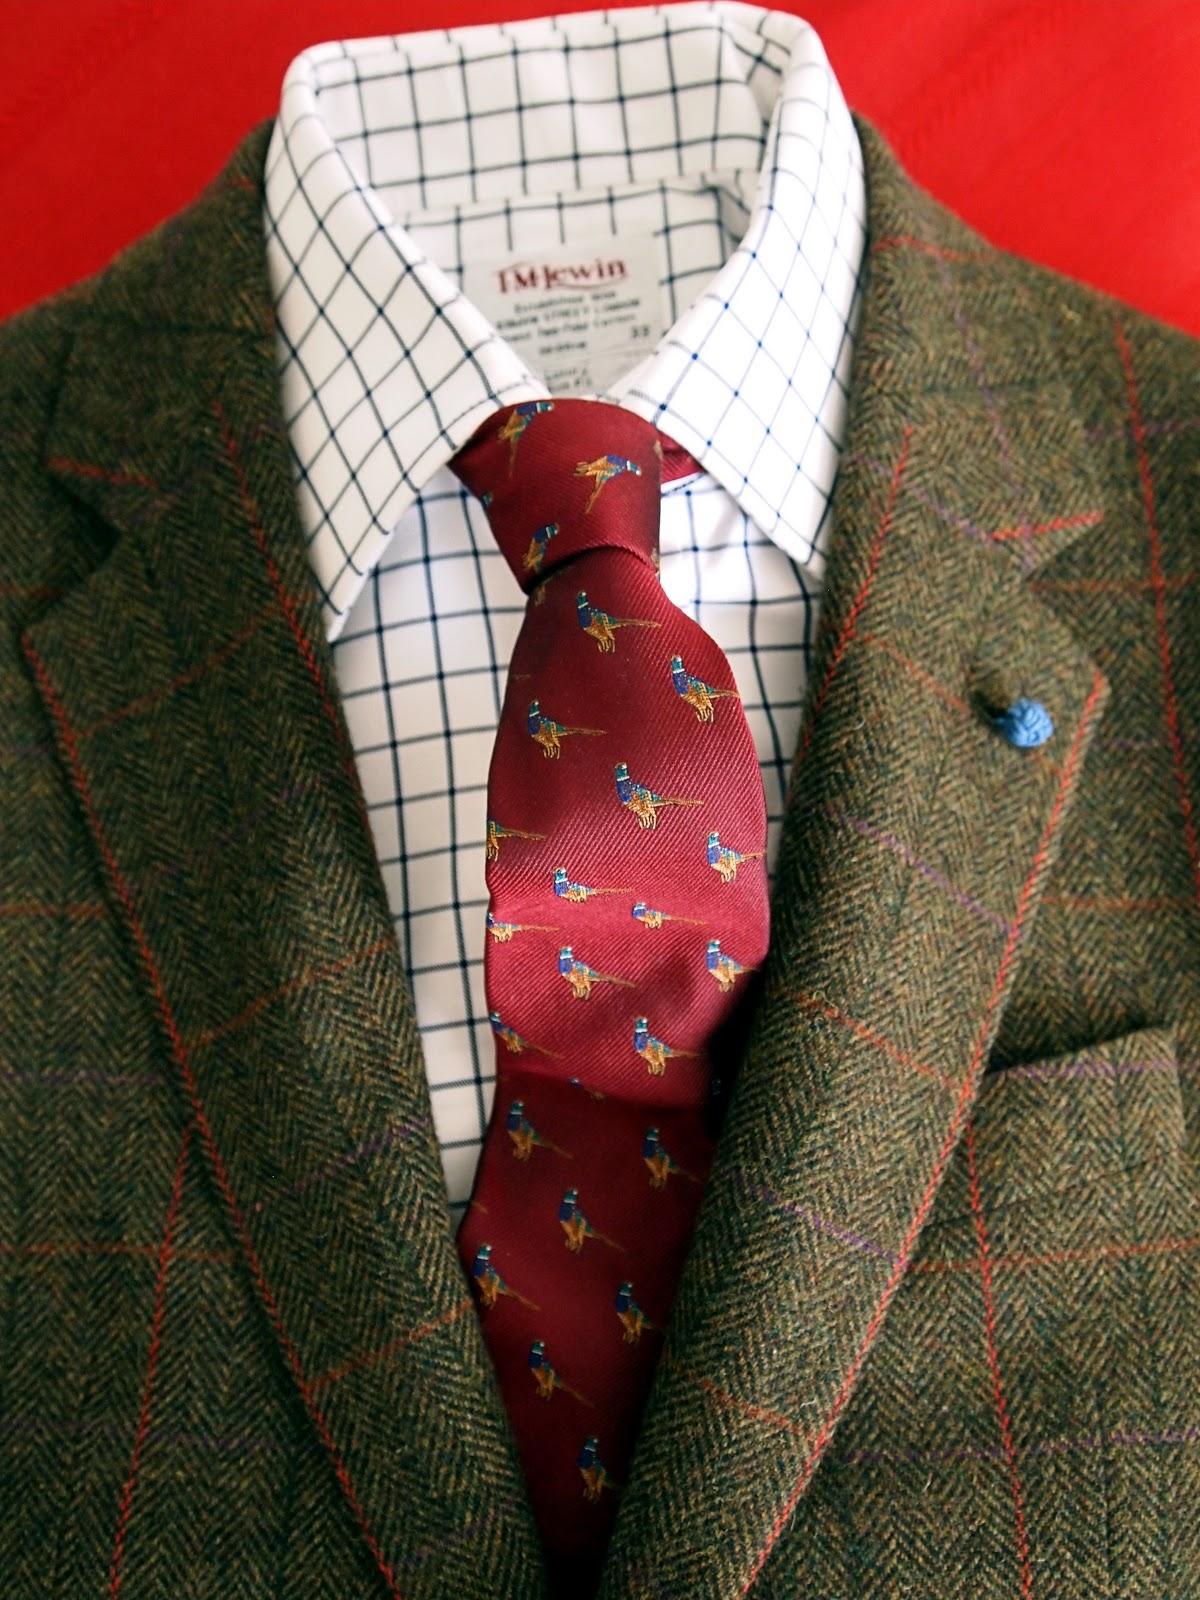 charles+tyrwhitt+yorkshire+tweed+sport+jacket+1+%25281%2529.JPG